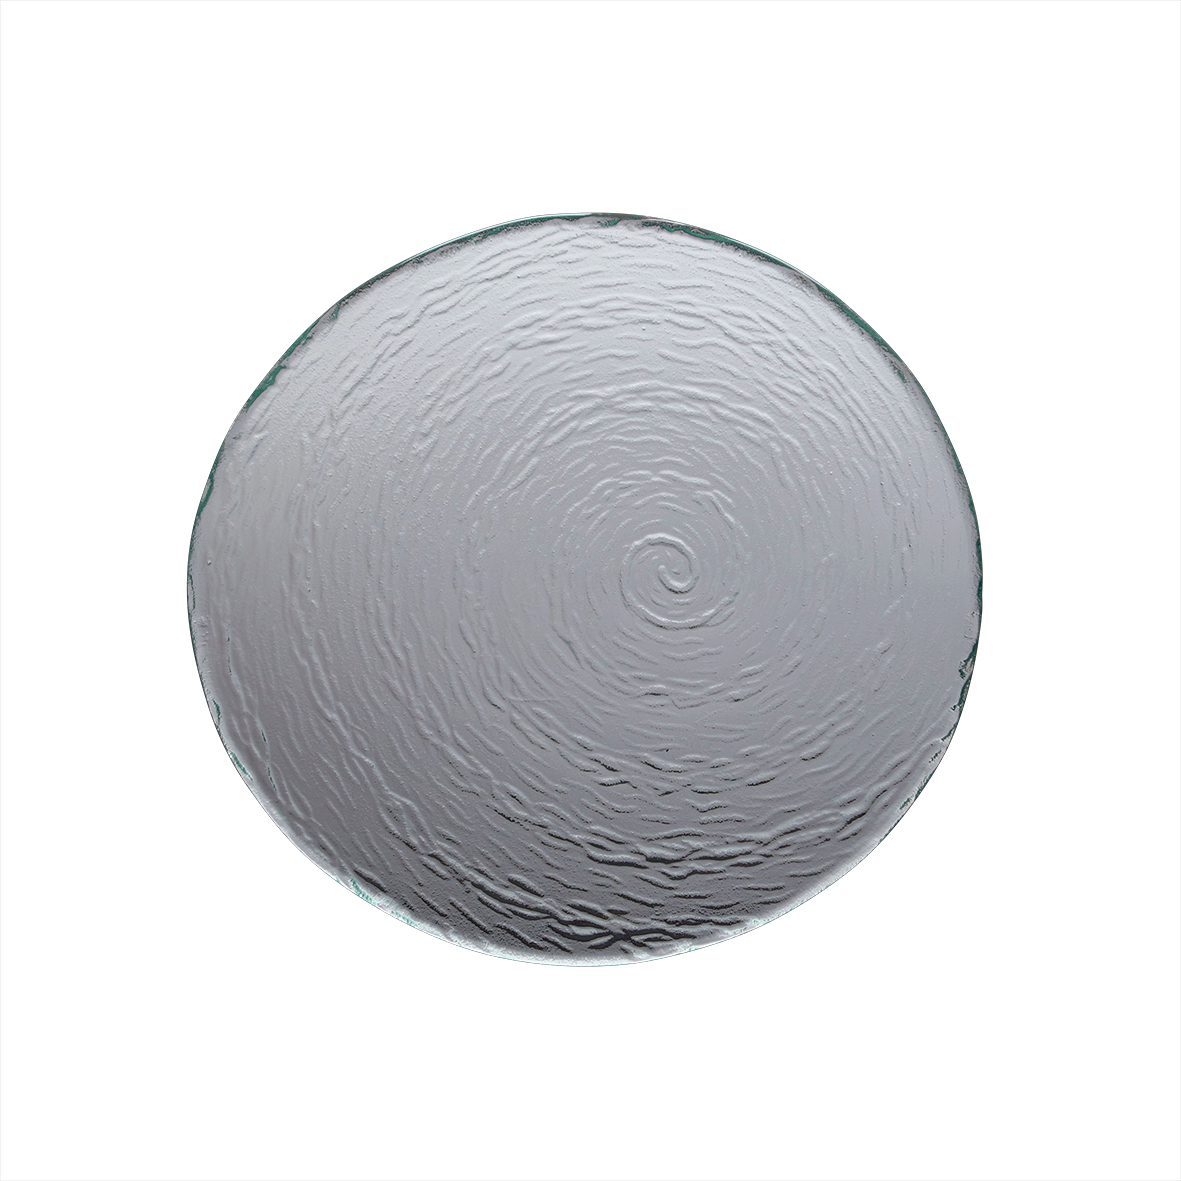 Онлайн каталог PROMENU: Тарелка стеклянная Steelite Scape Glass Clear, 30 см                               6512G380